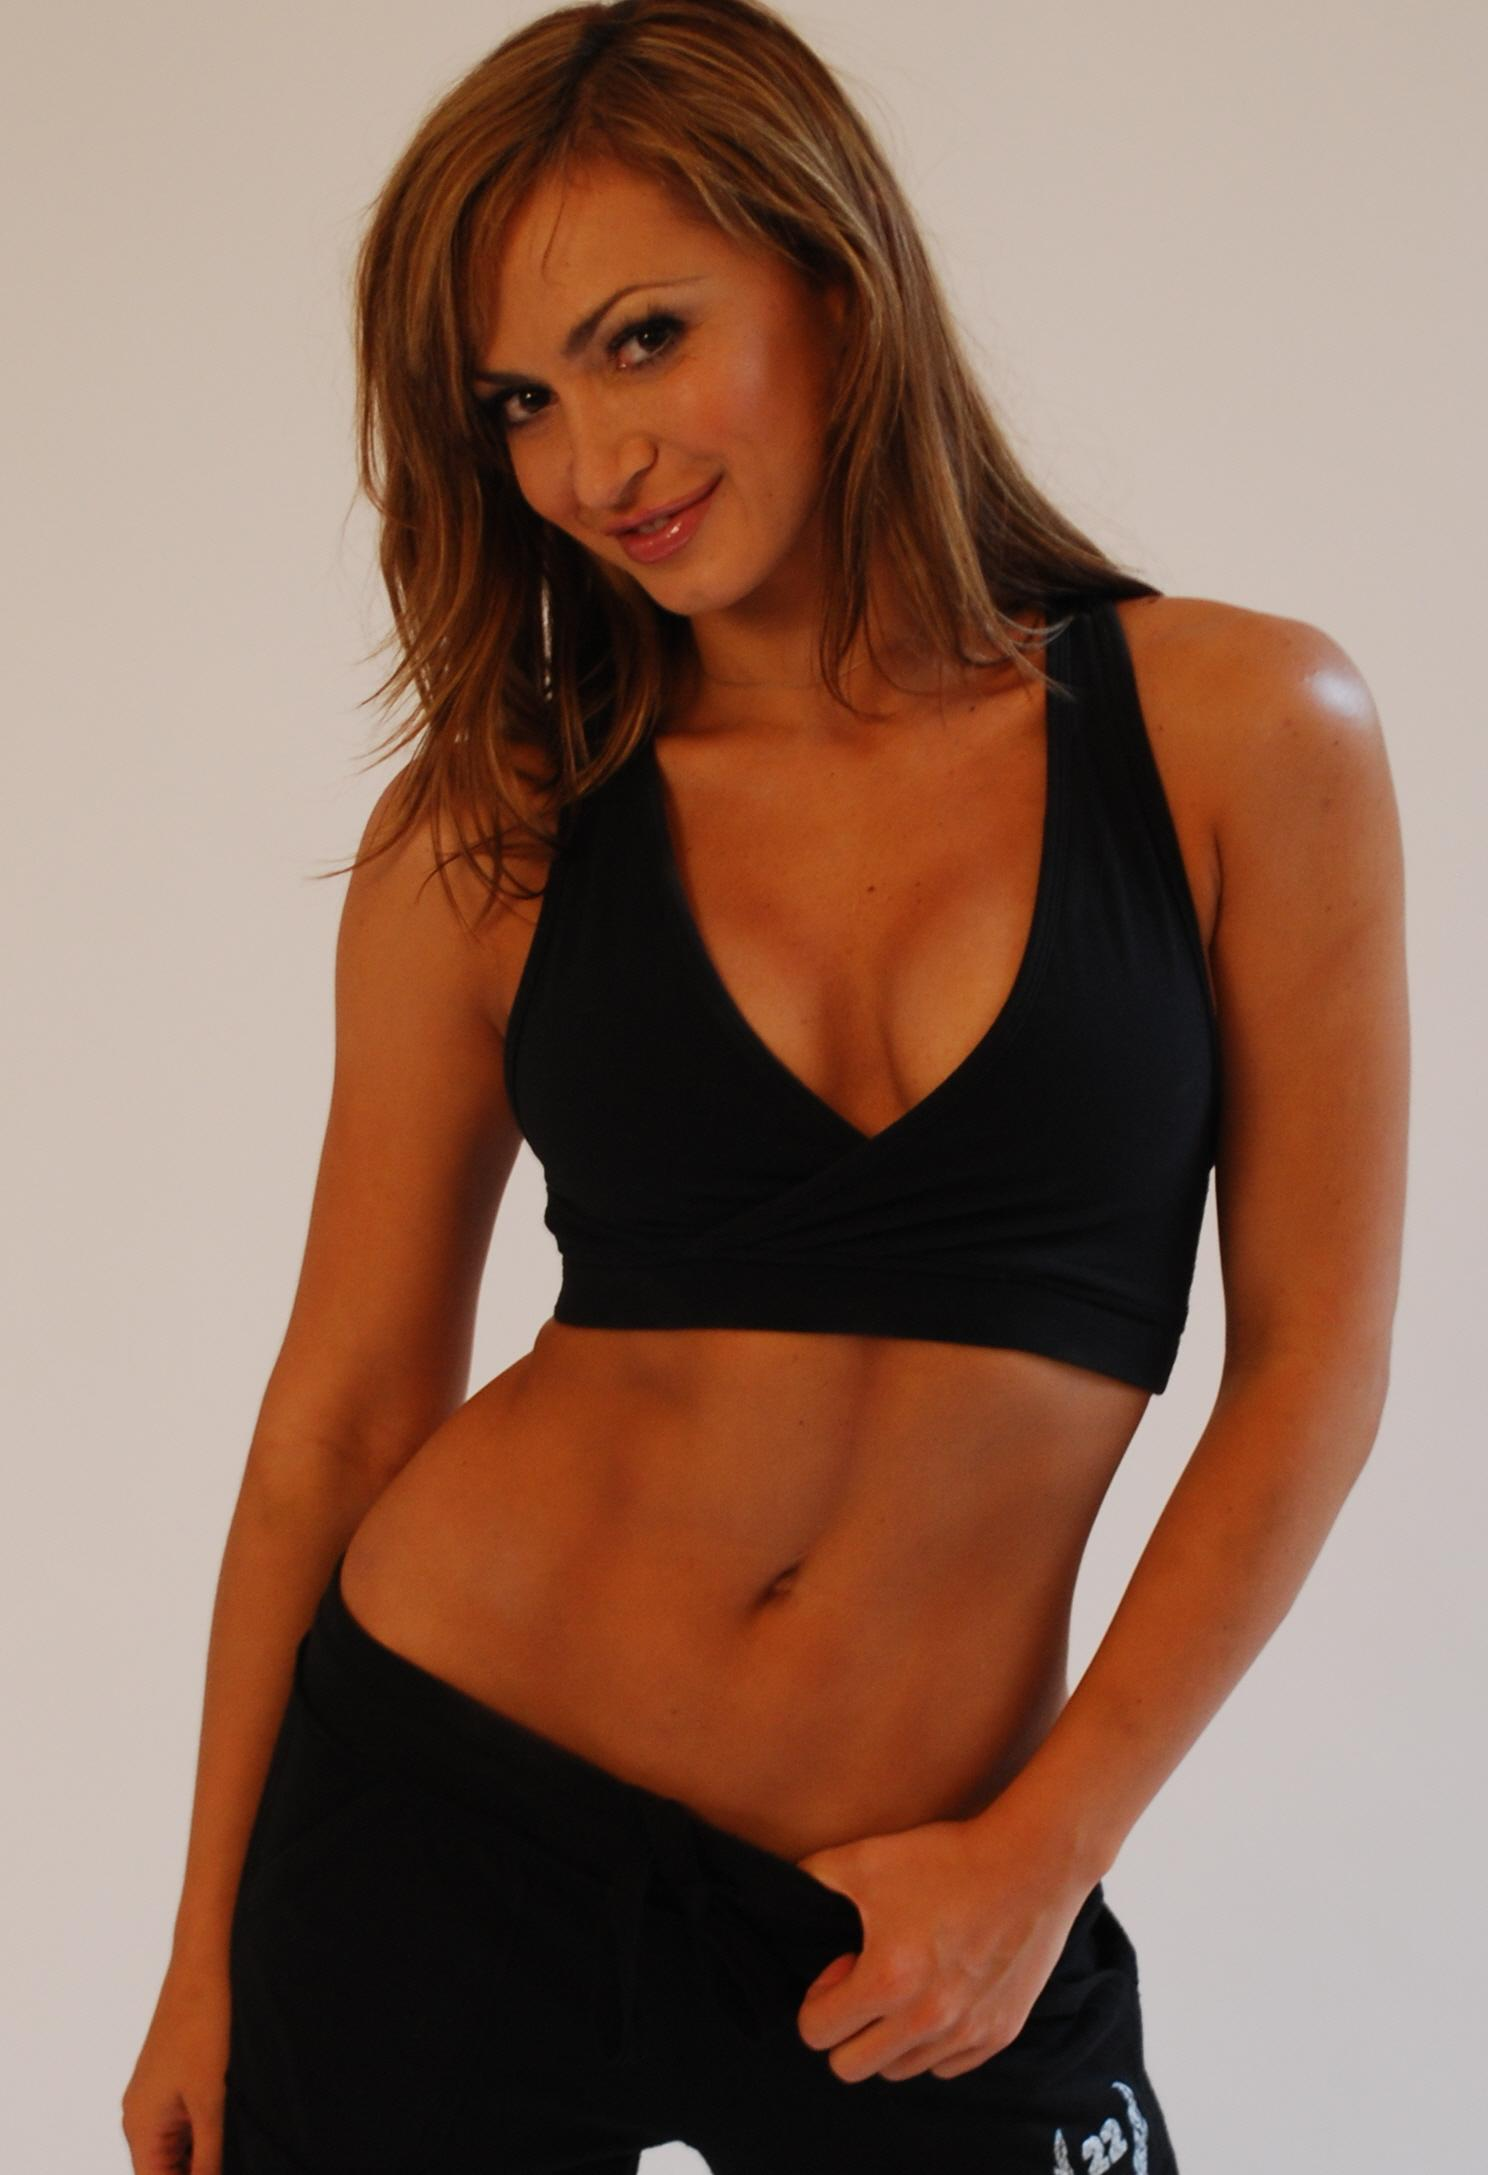 Hot Karina Smirnoff nudes (26 photos), Pussy, Sideboobs, Twitter, braless 2006